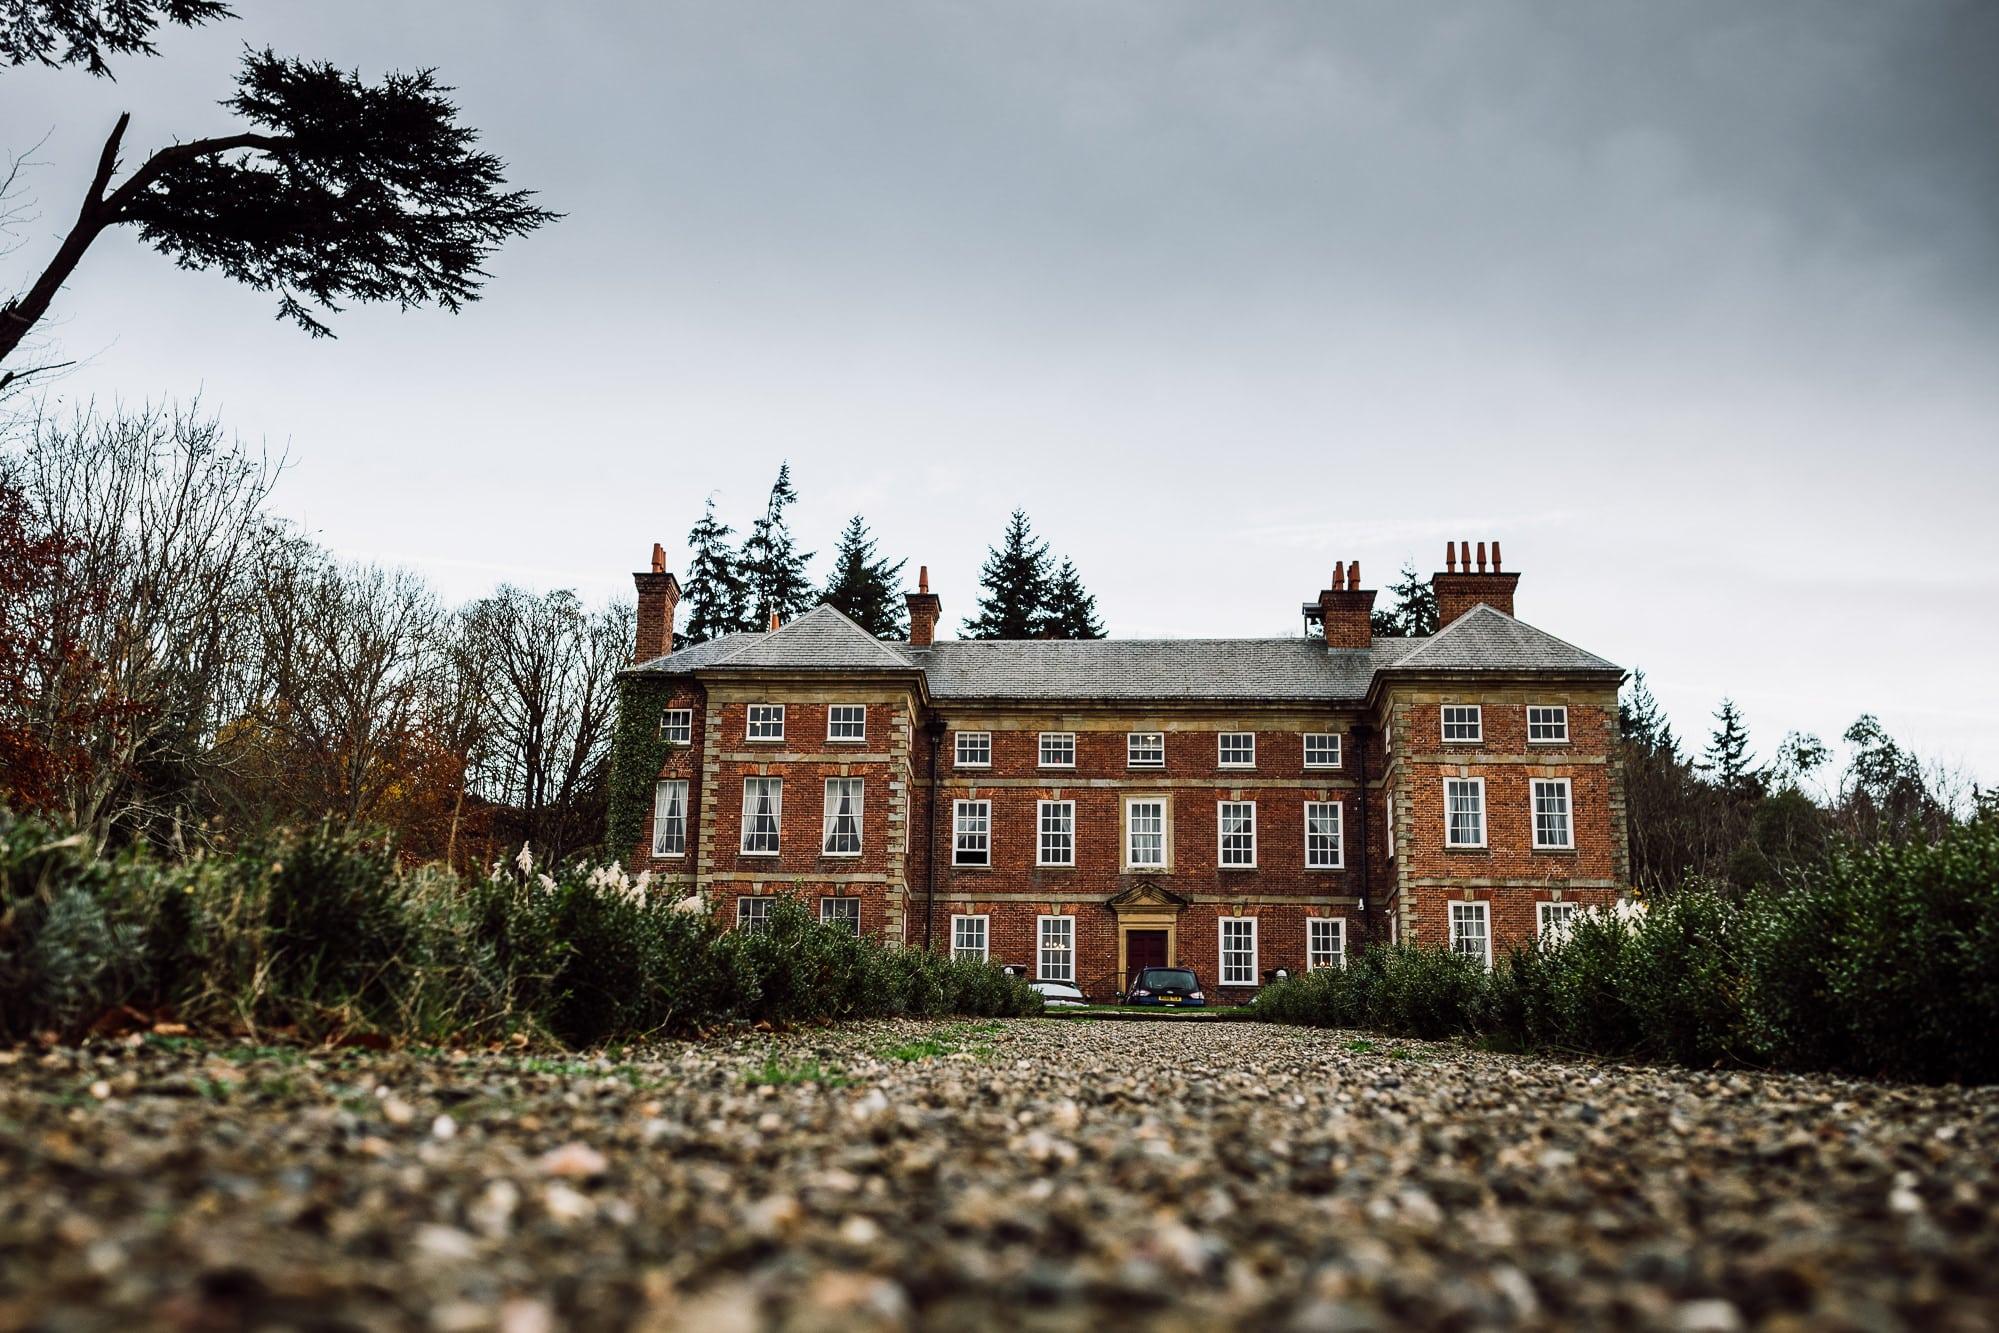 A photo of trevor Hall